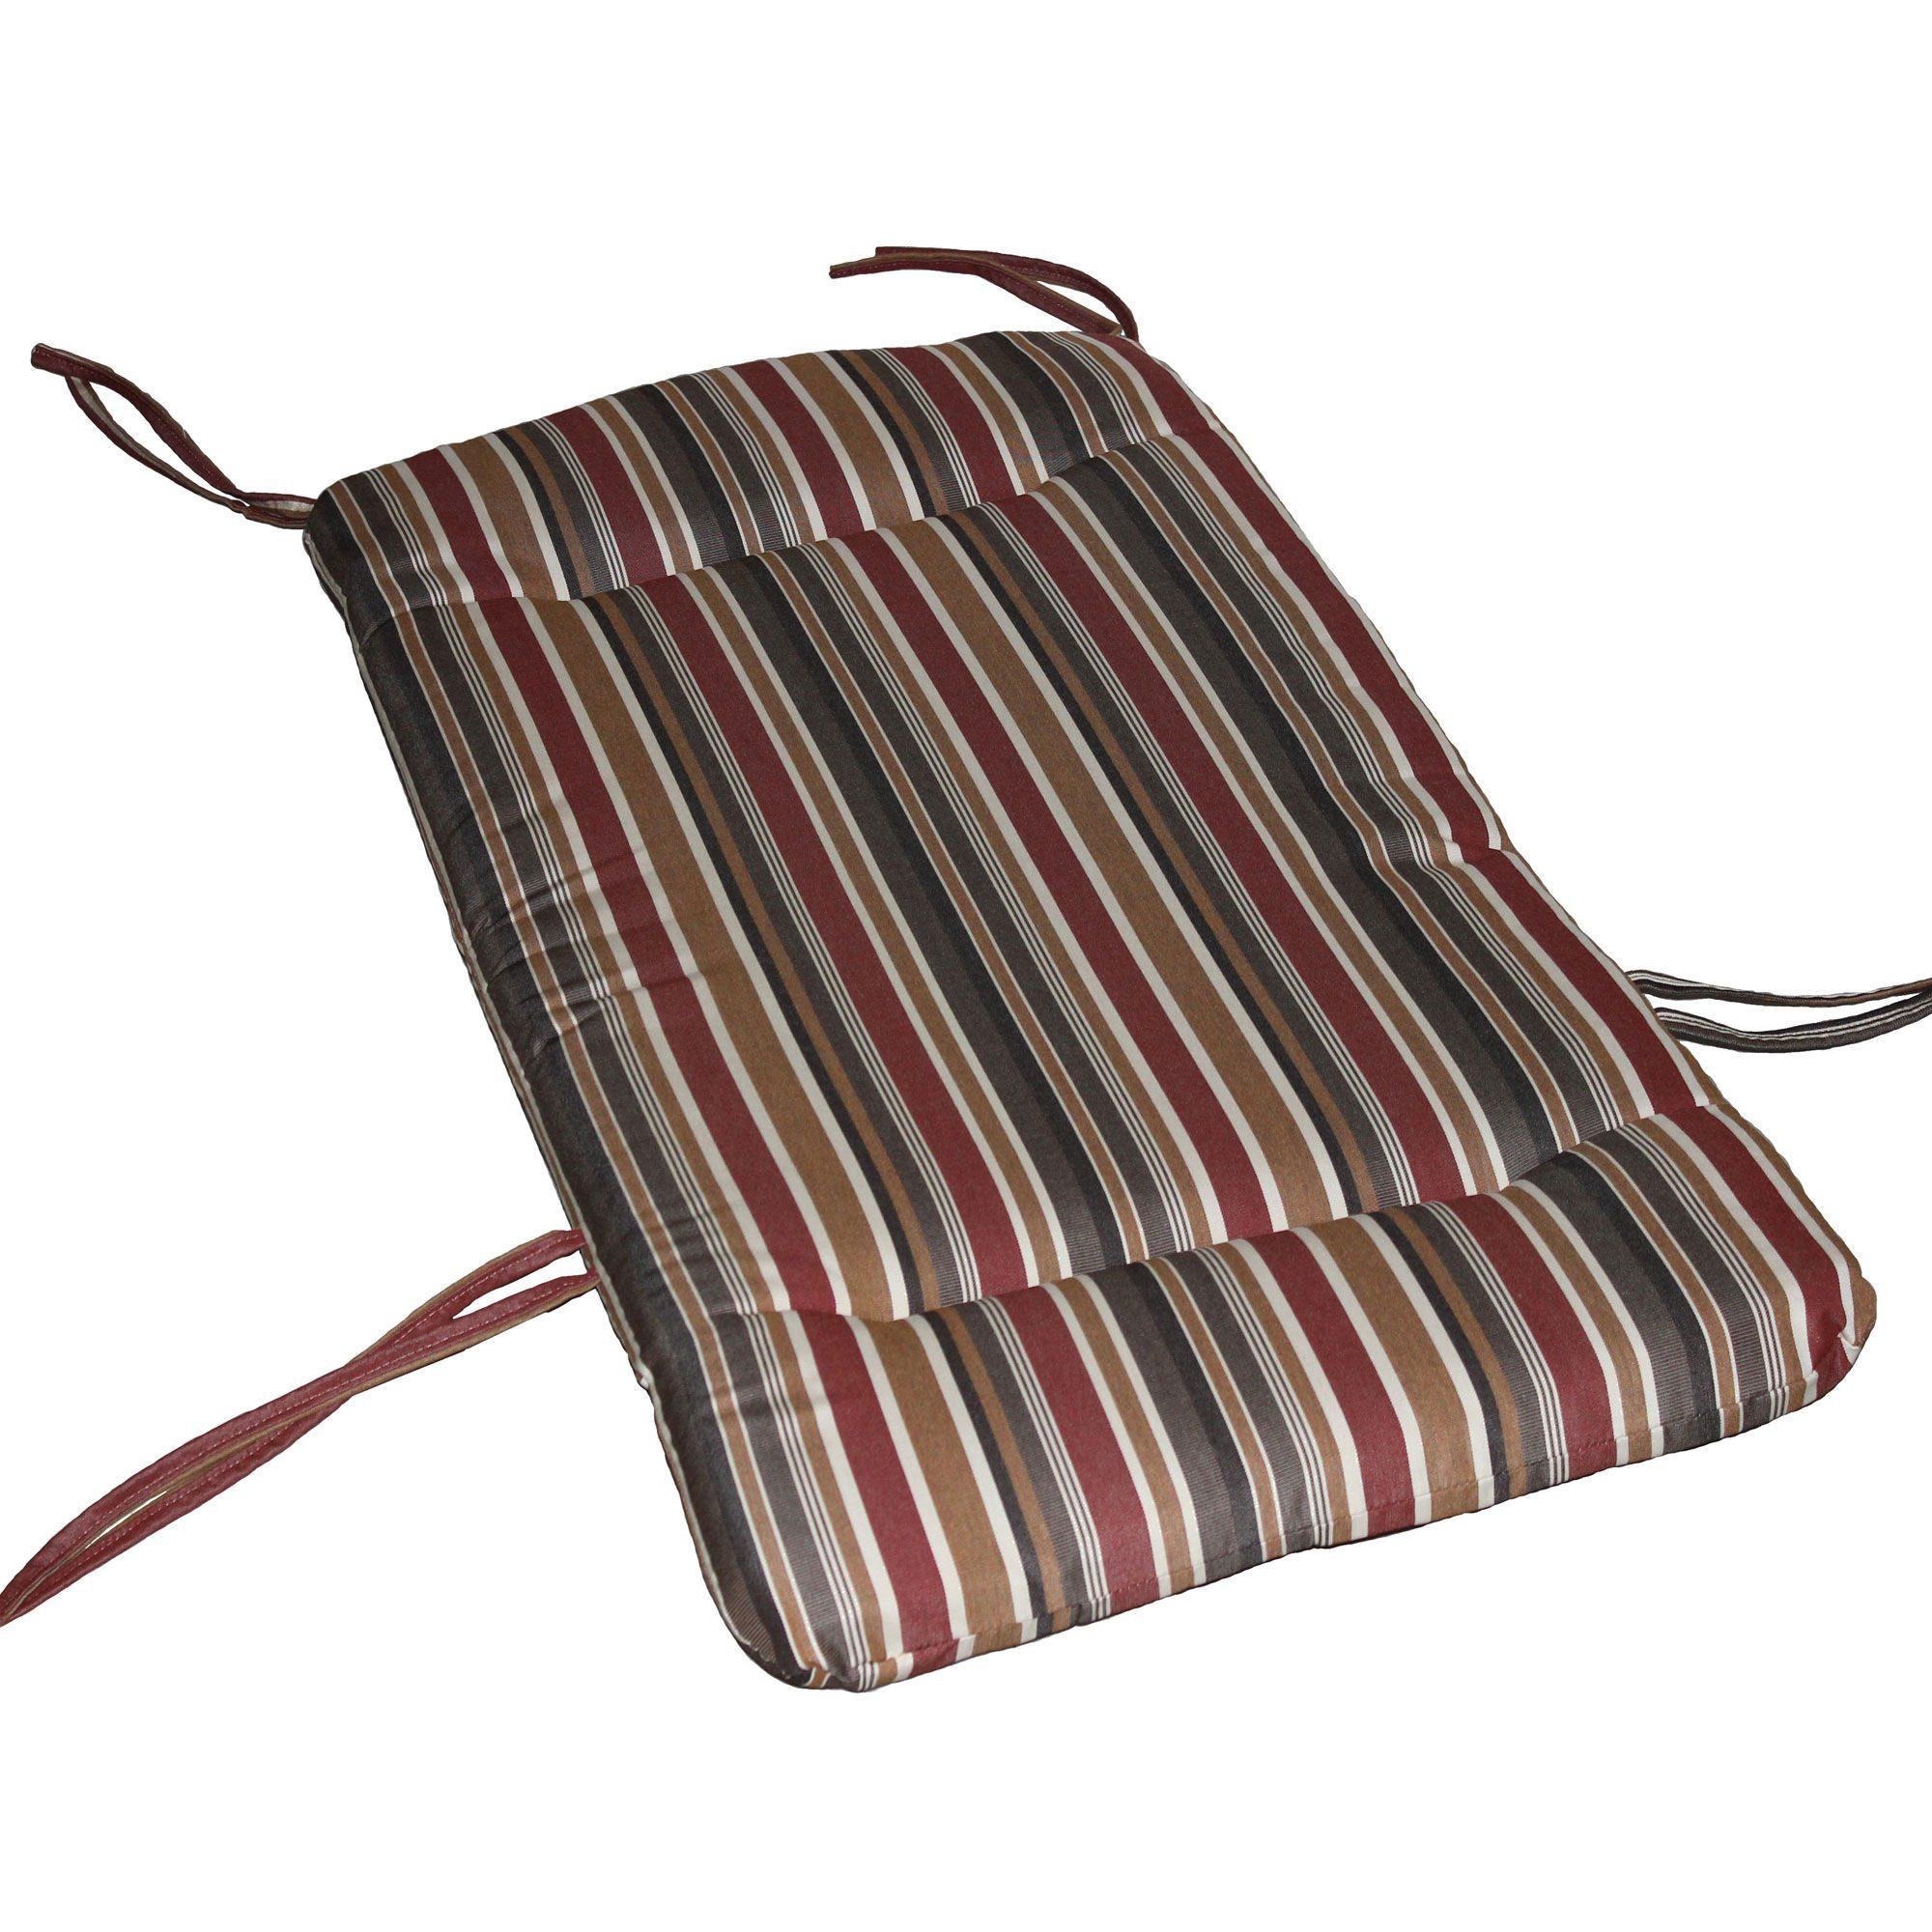 fo back Chaise Lounge Sunbrella Seat Cushion Dimone